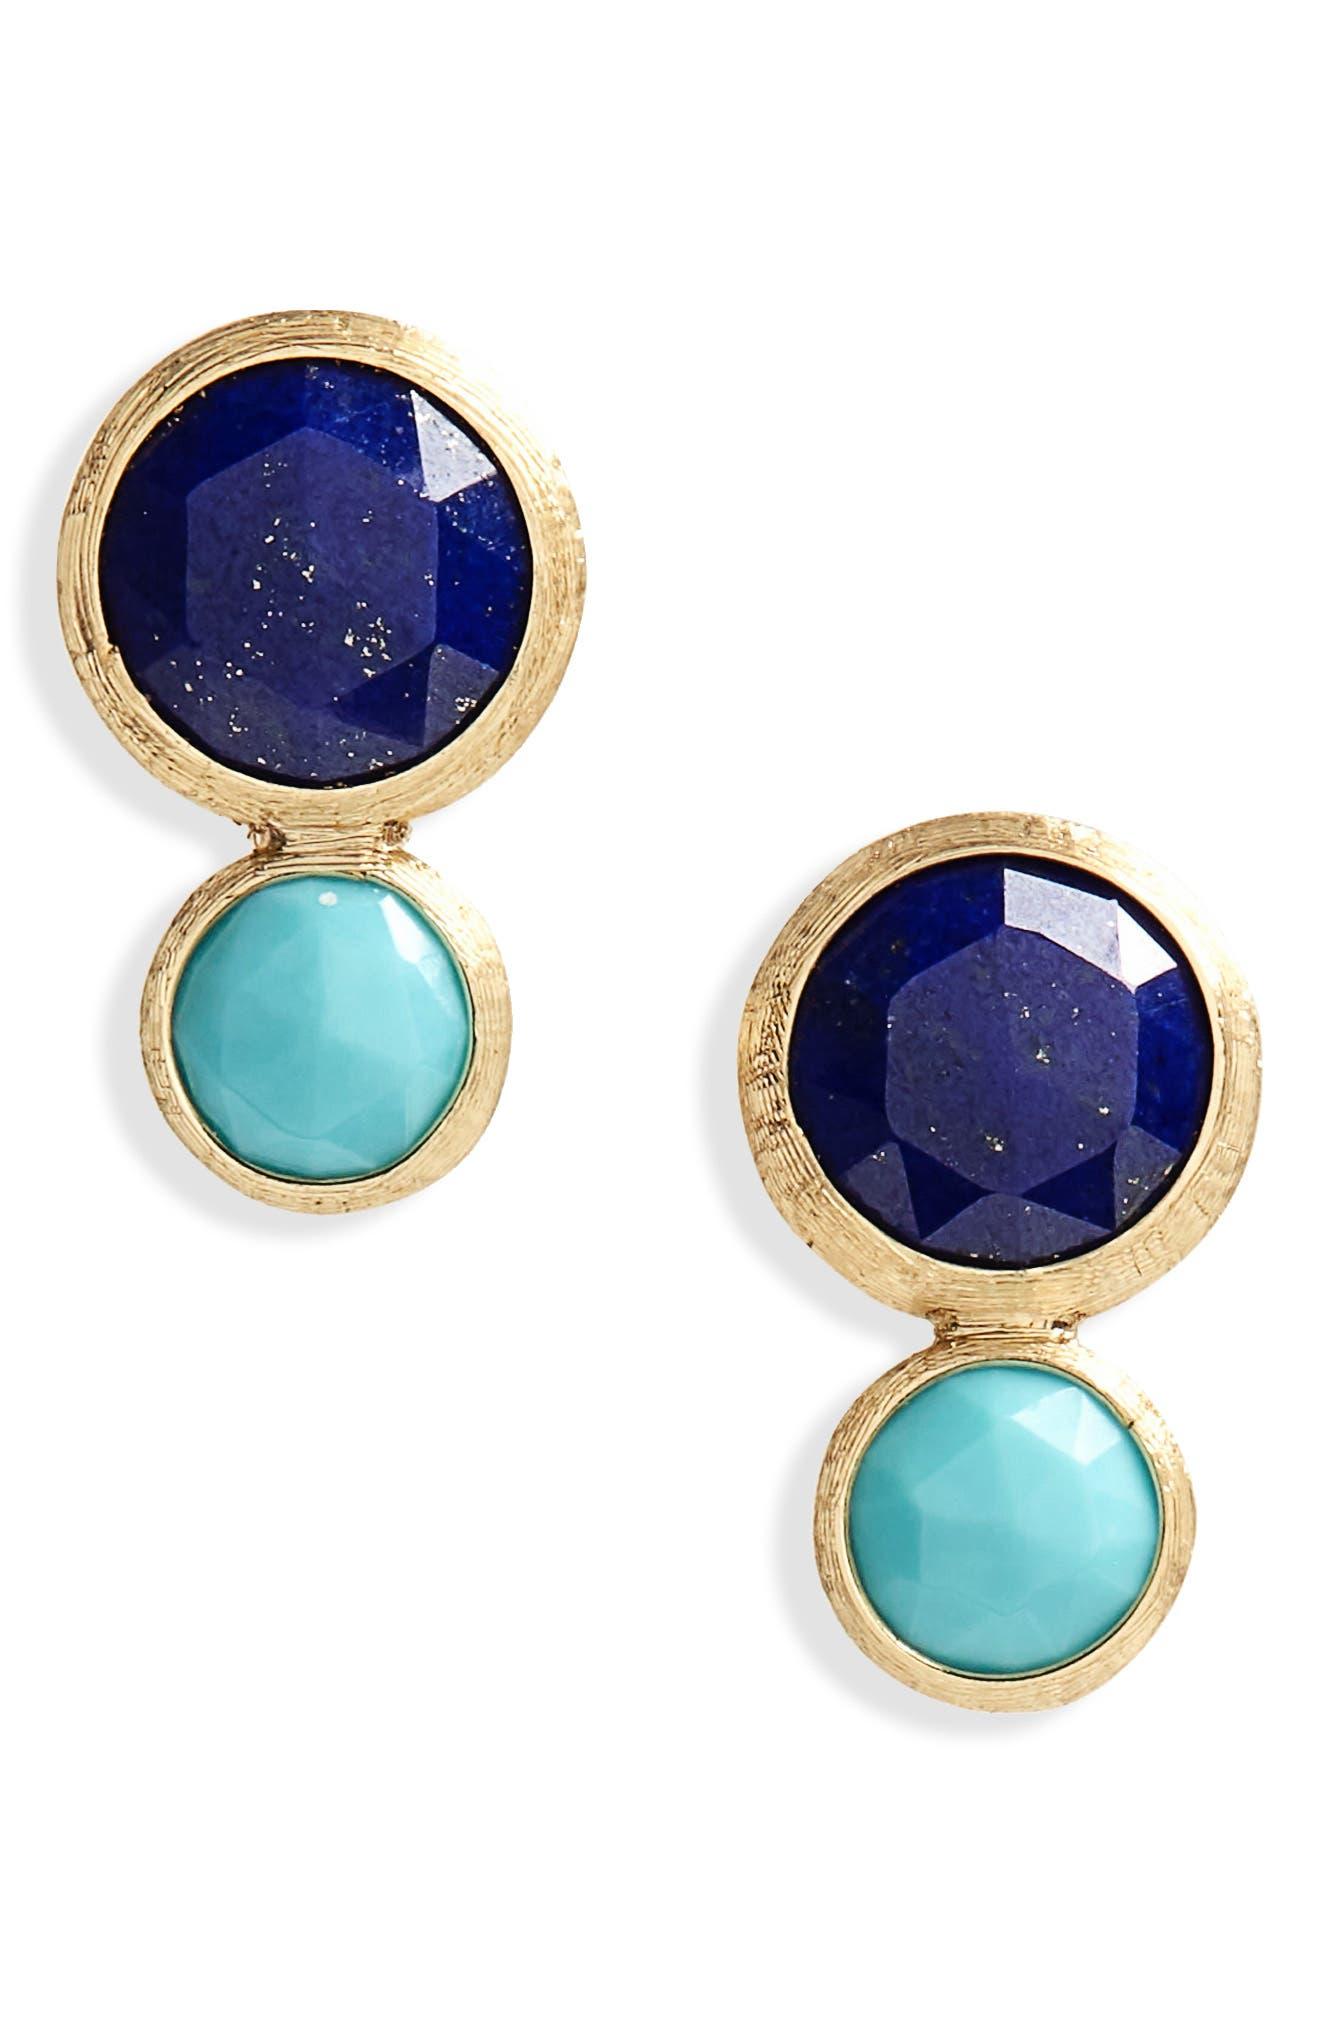 Jaipur Lapis & Turquoise Stud Earrings,                         Main,                         color, Yellow Gold Lapis/ Turquoise